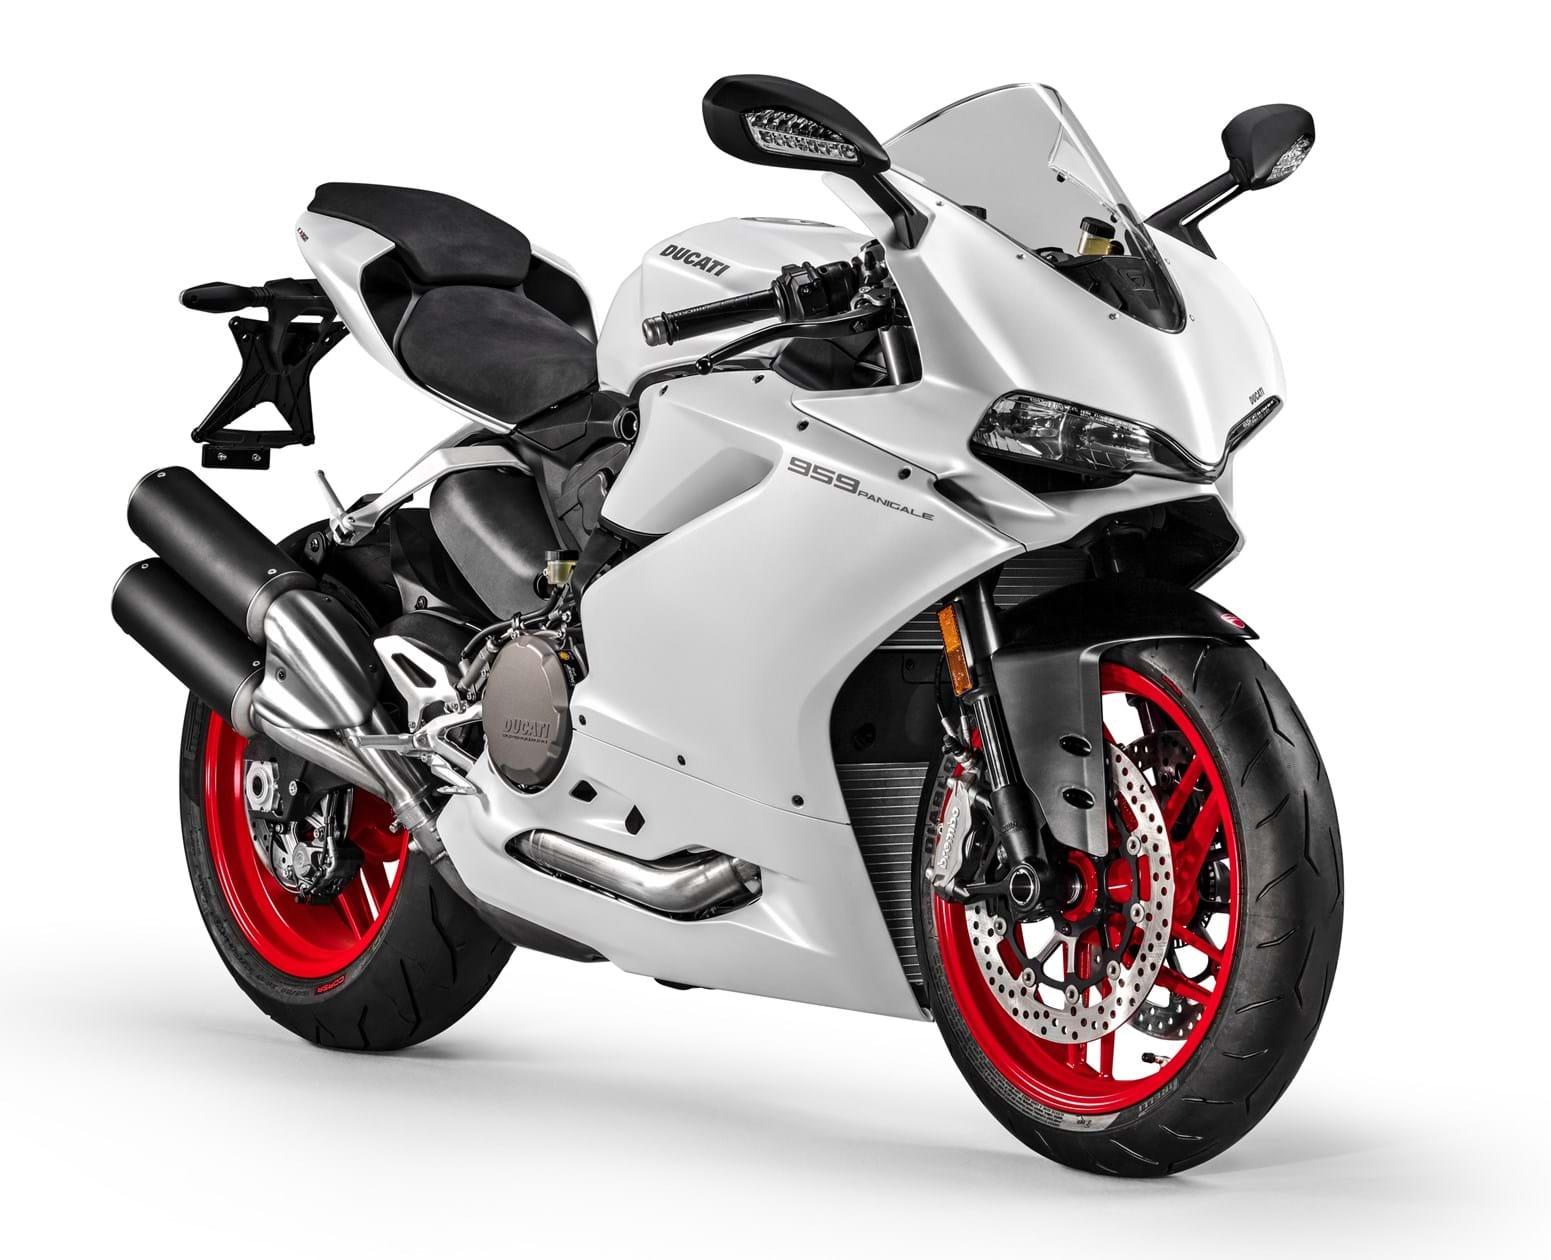 Ducati 959 Panigale • For Sale • Price Guide • The Bike Market